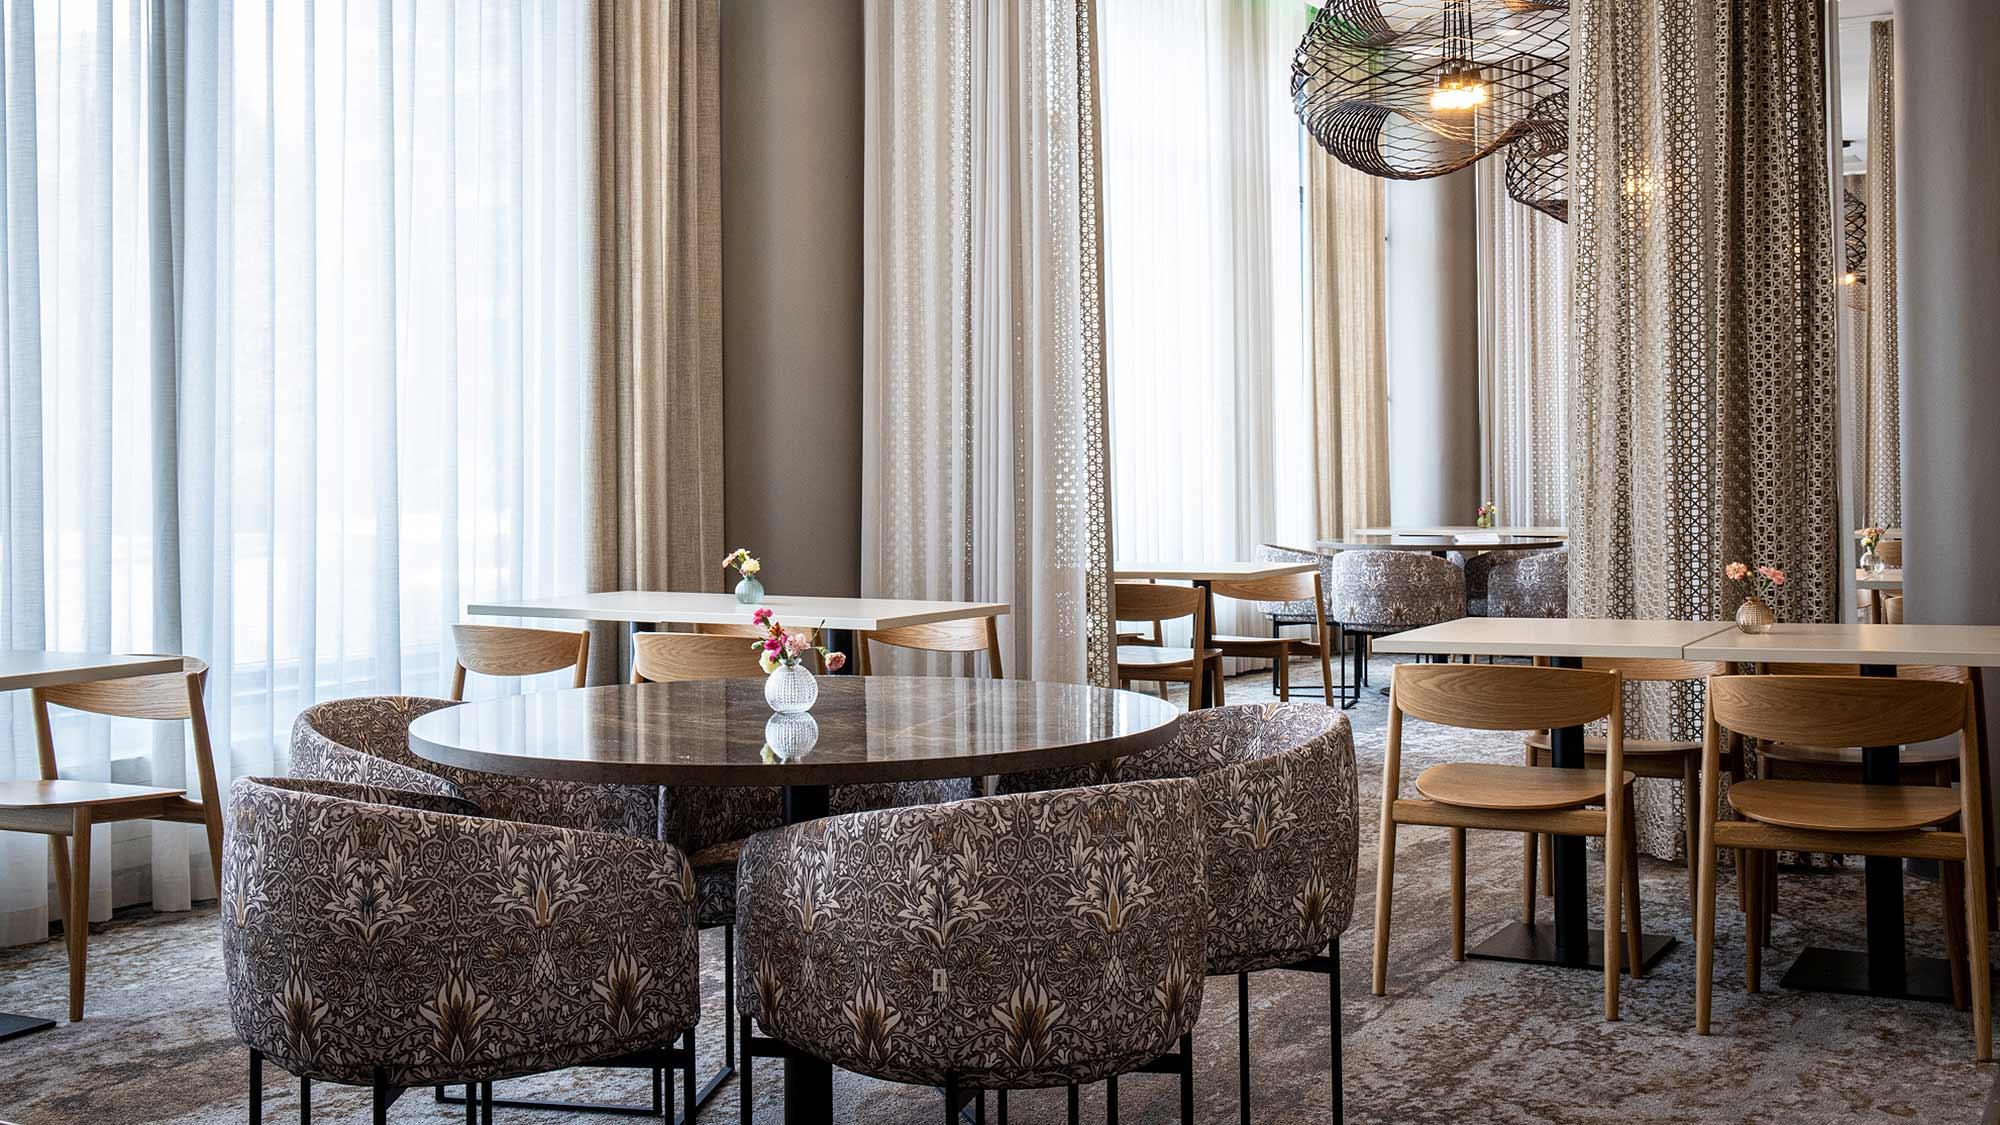 Hotel Mattsin alakerran ravintola Frejan ravintolasali.